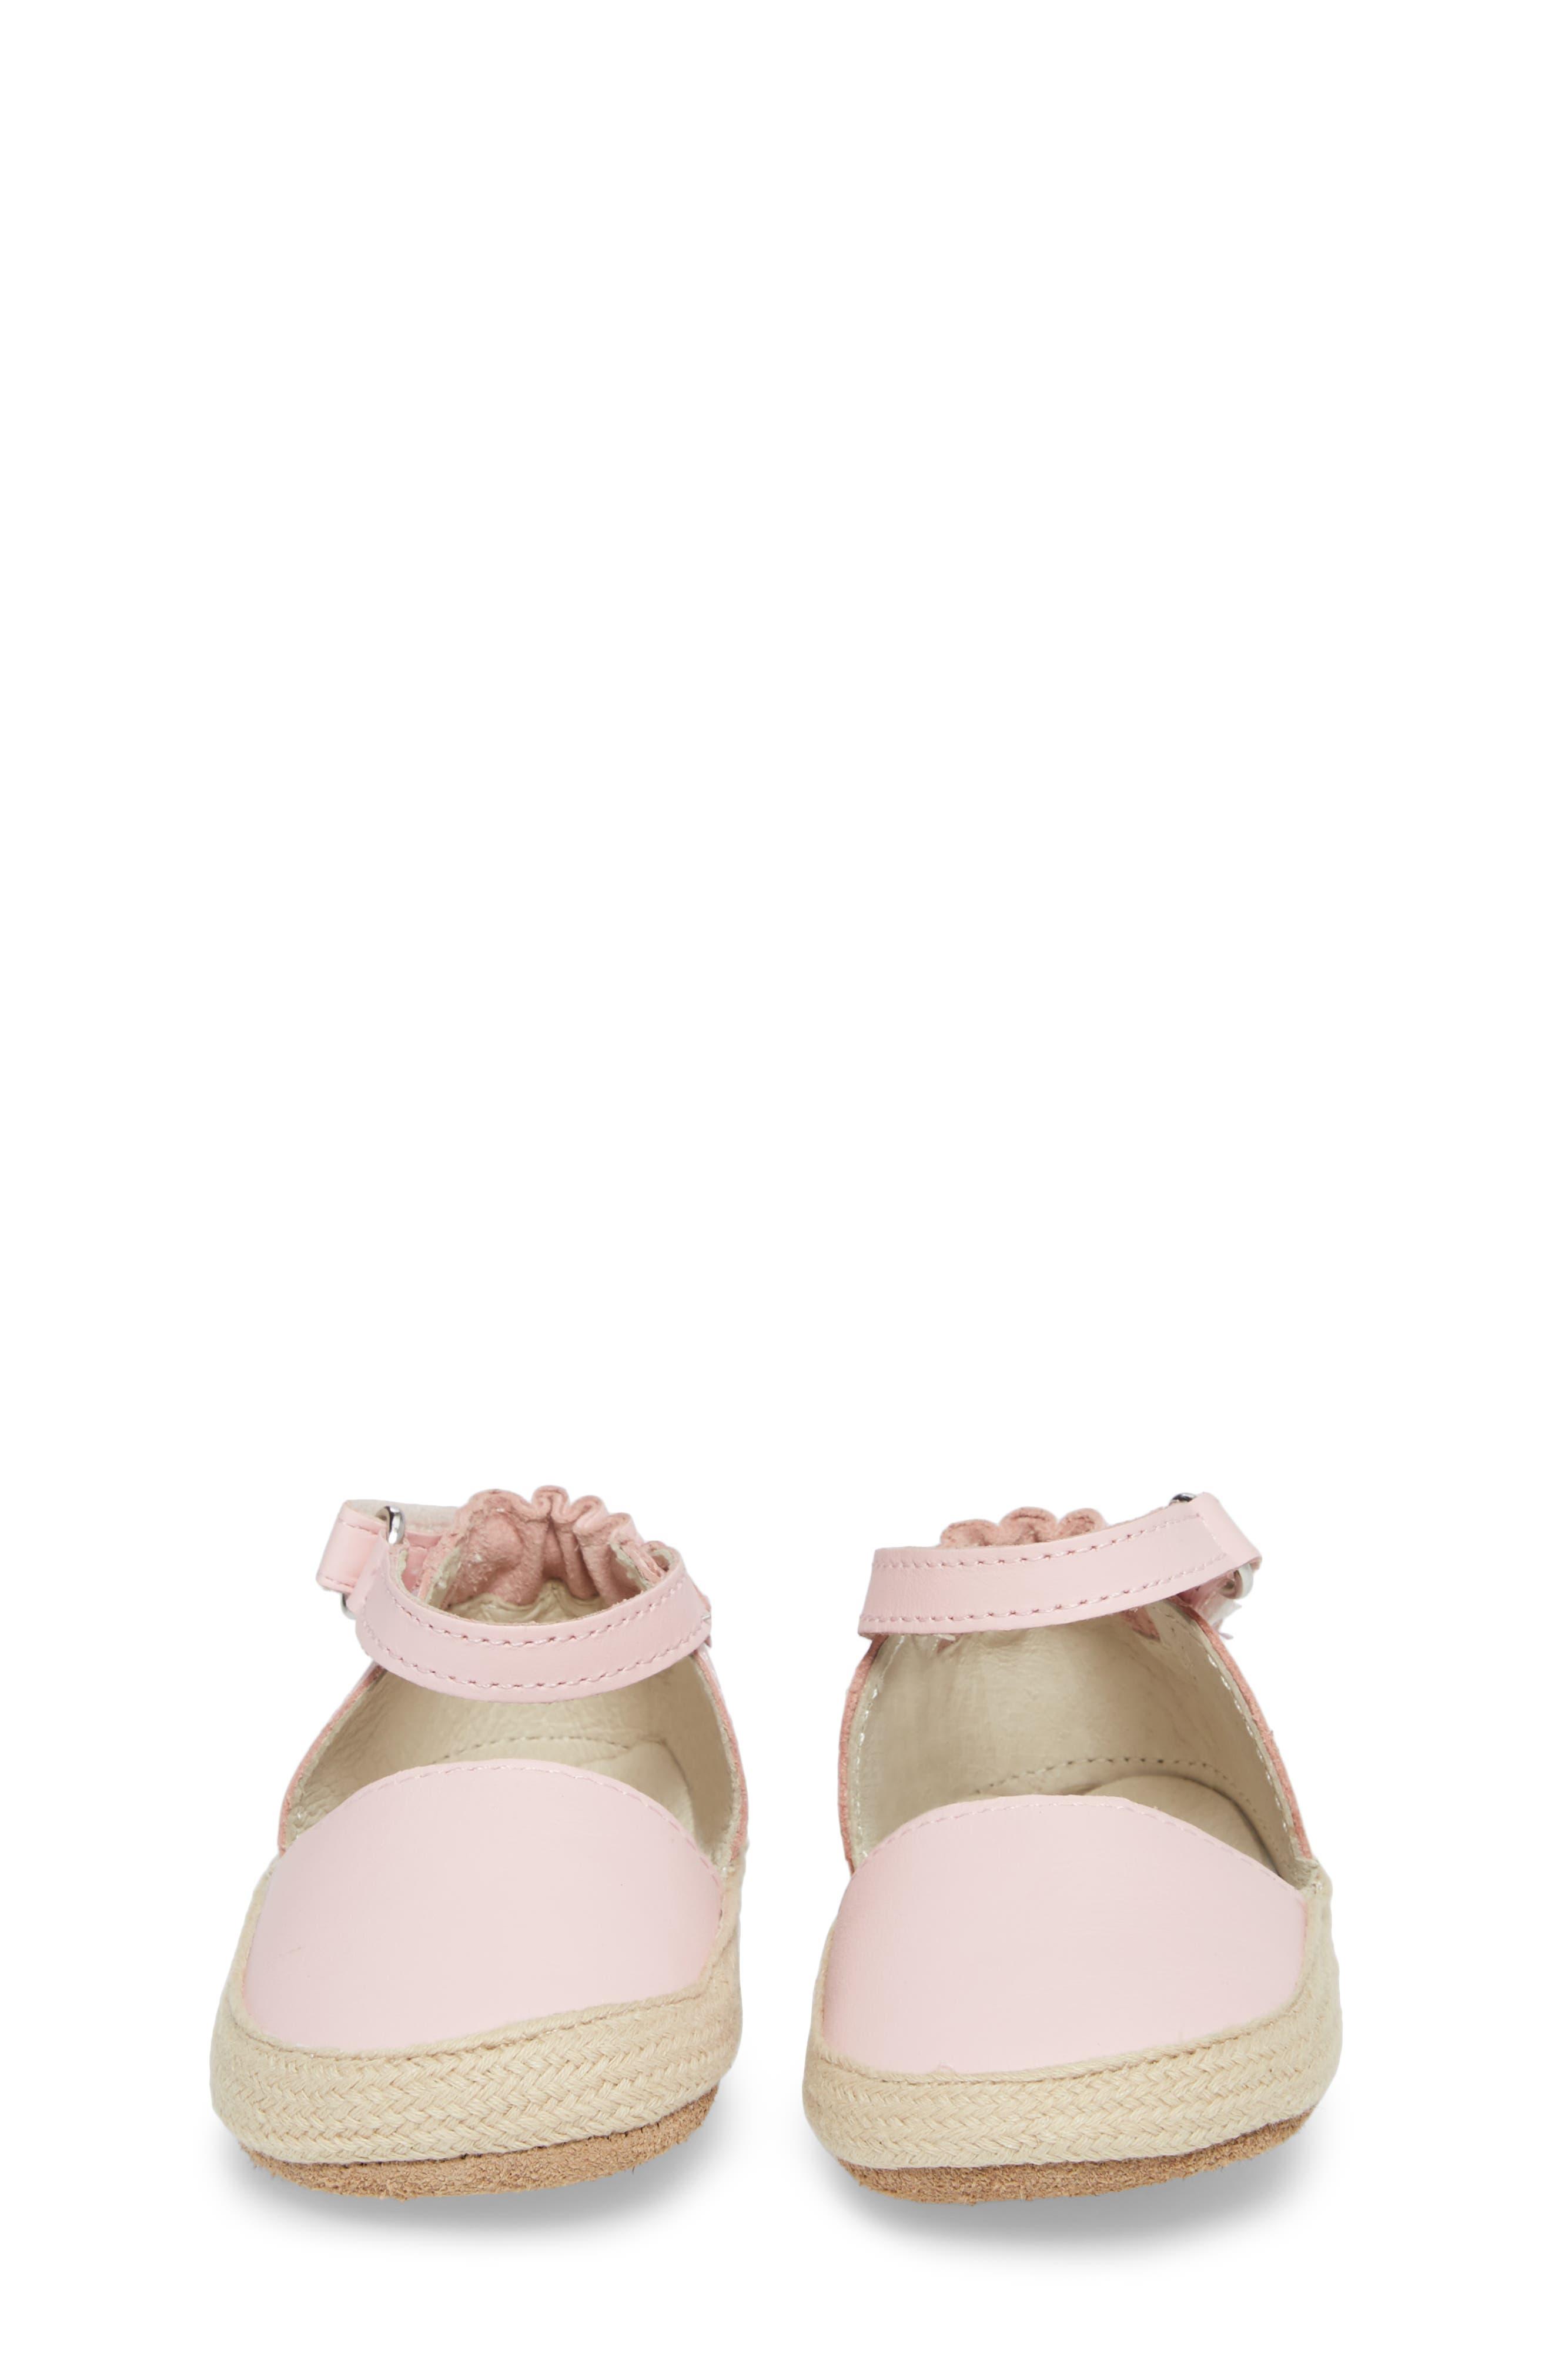 Kelly Soft Sole Espadrille Sandal,                             Alternate thumbnail 5, color,                             Pink